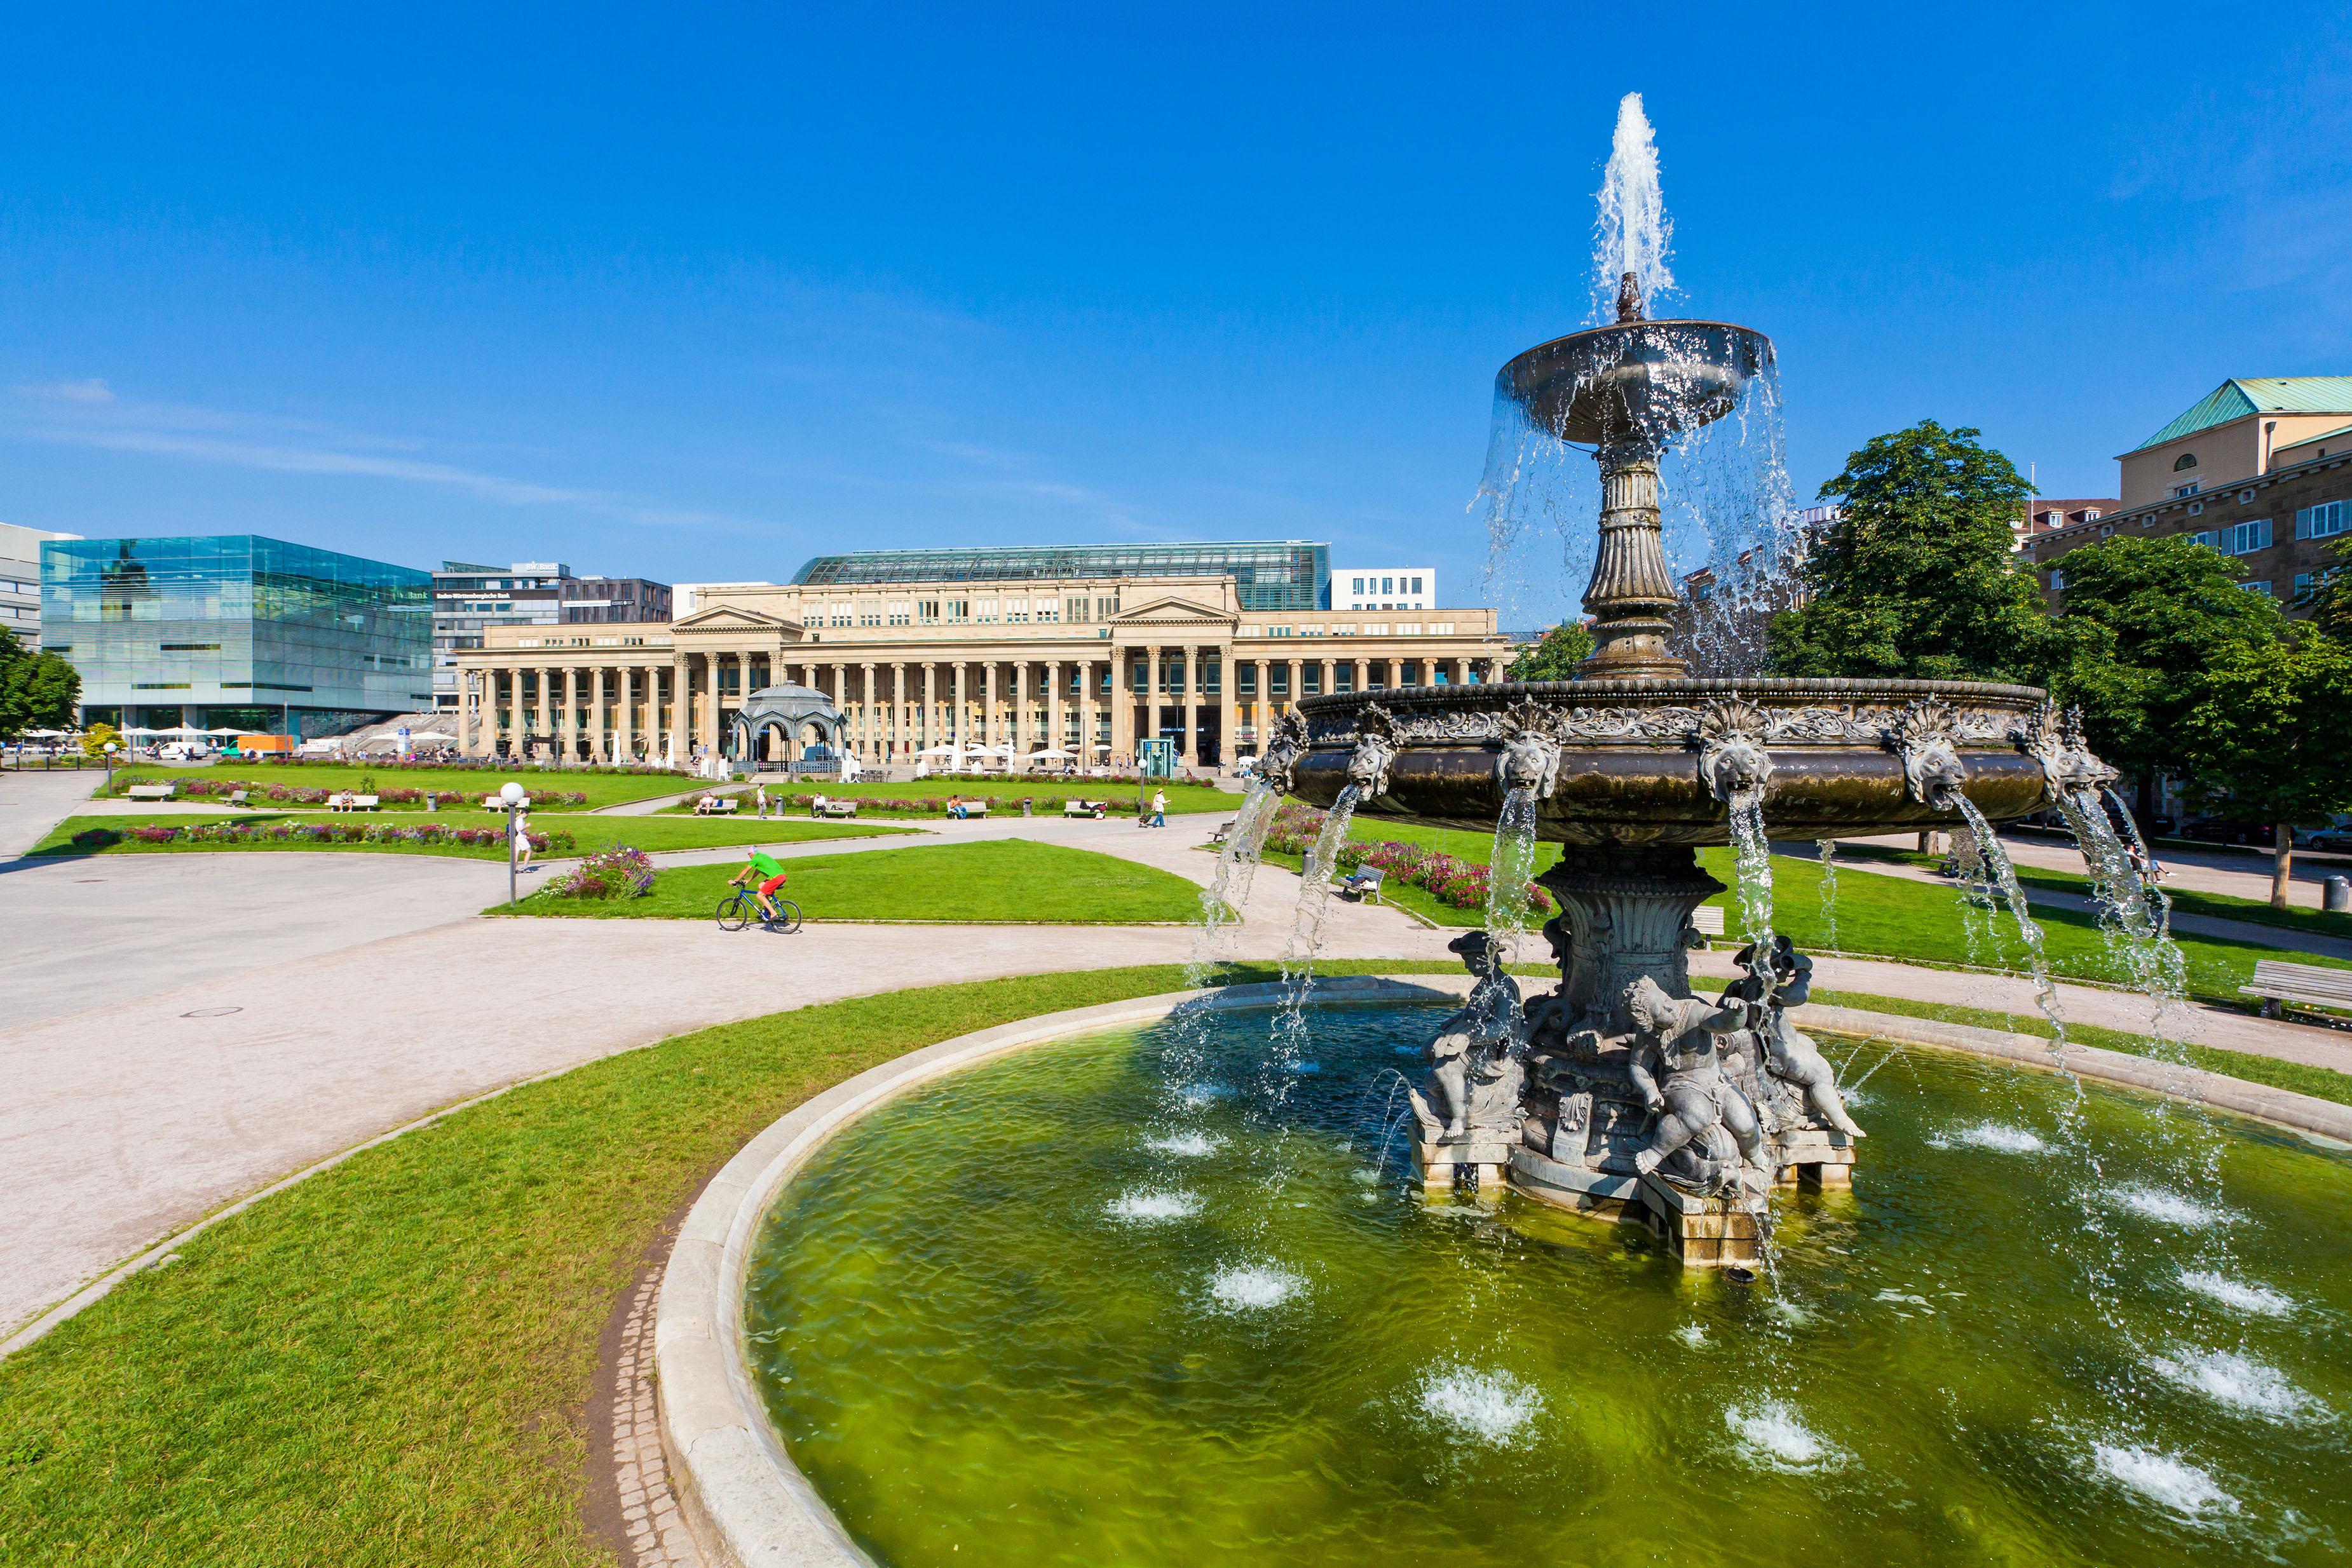 Kunstmuseum, Königsbau, Schlossplatz, Stuttgart